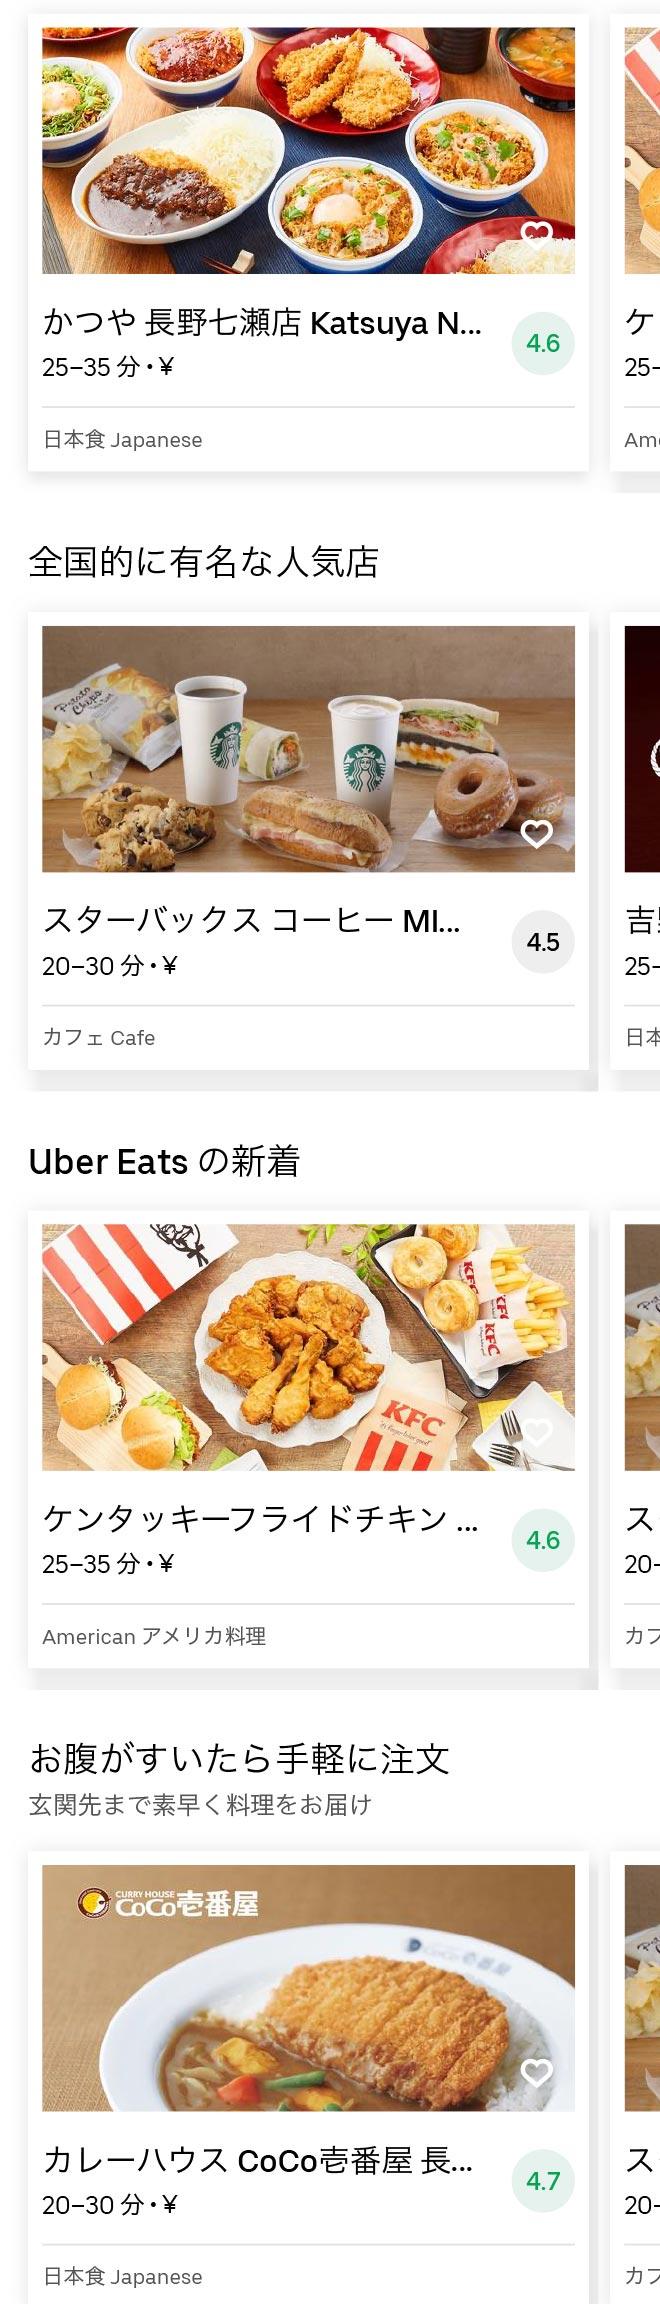 Niigata menu 2007 01